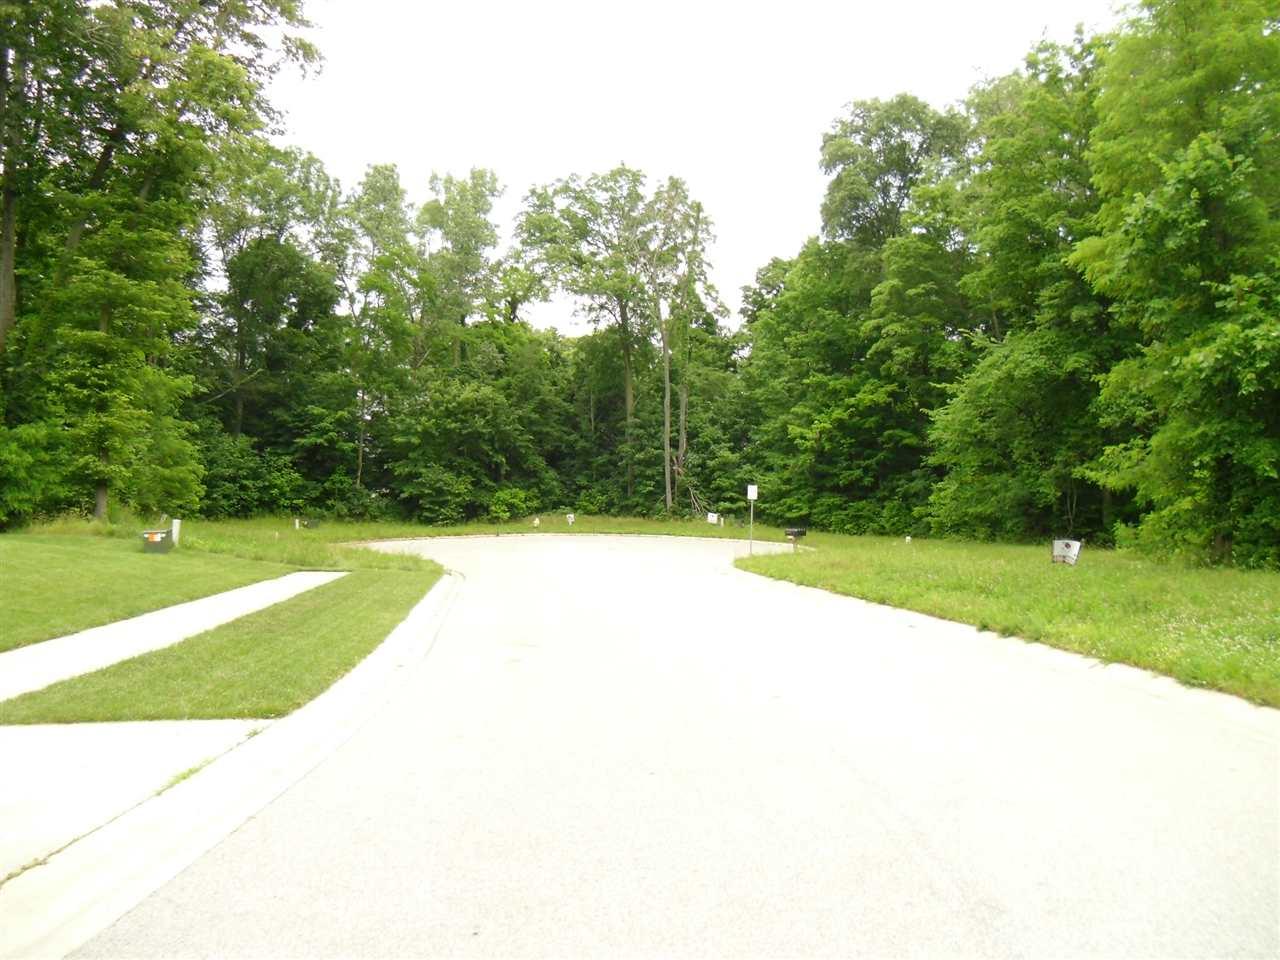 422 Mcintosh Ave, Kendallville, IN 46755